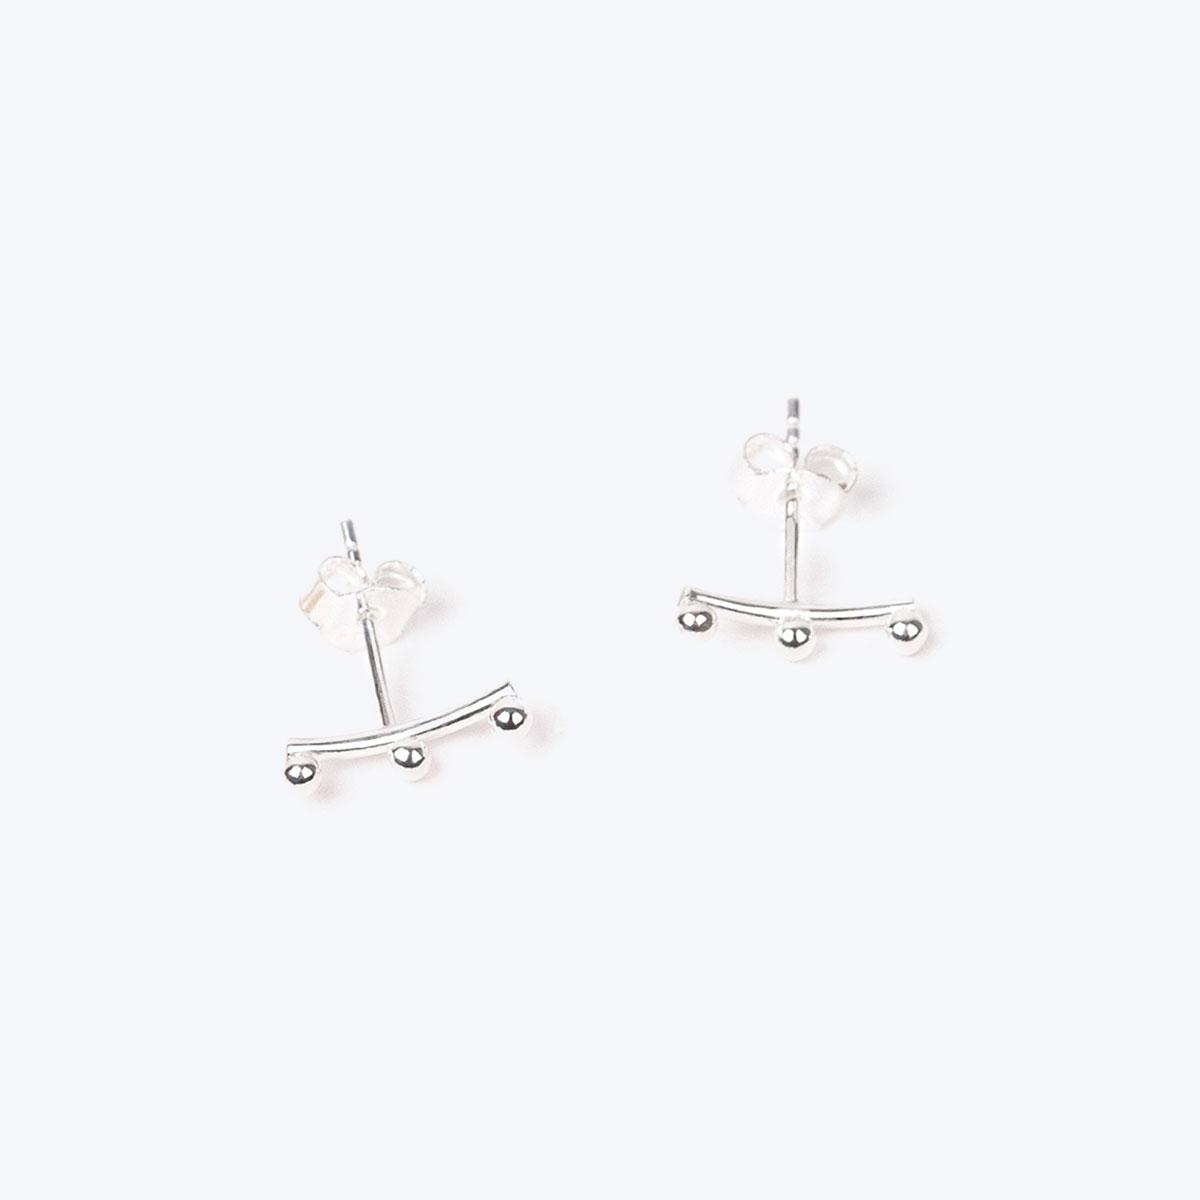 silver constellation earrings